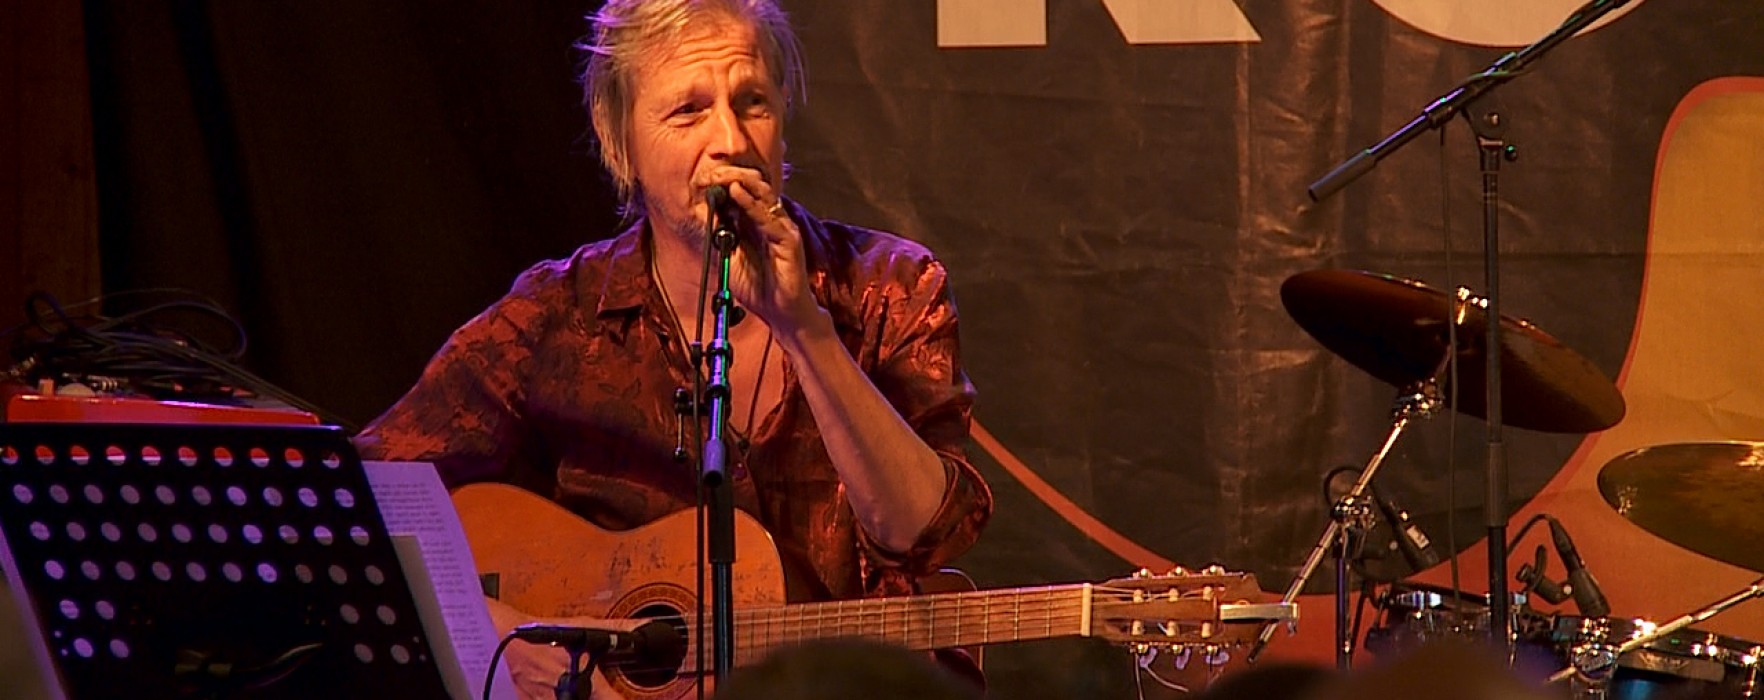 Glimt – Folk & Rock i Segmon, Stefan Sundström (ep 4:6)